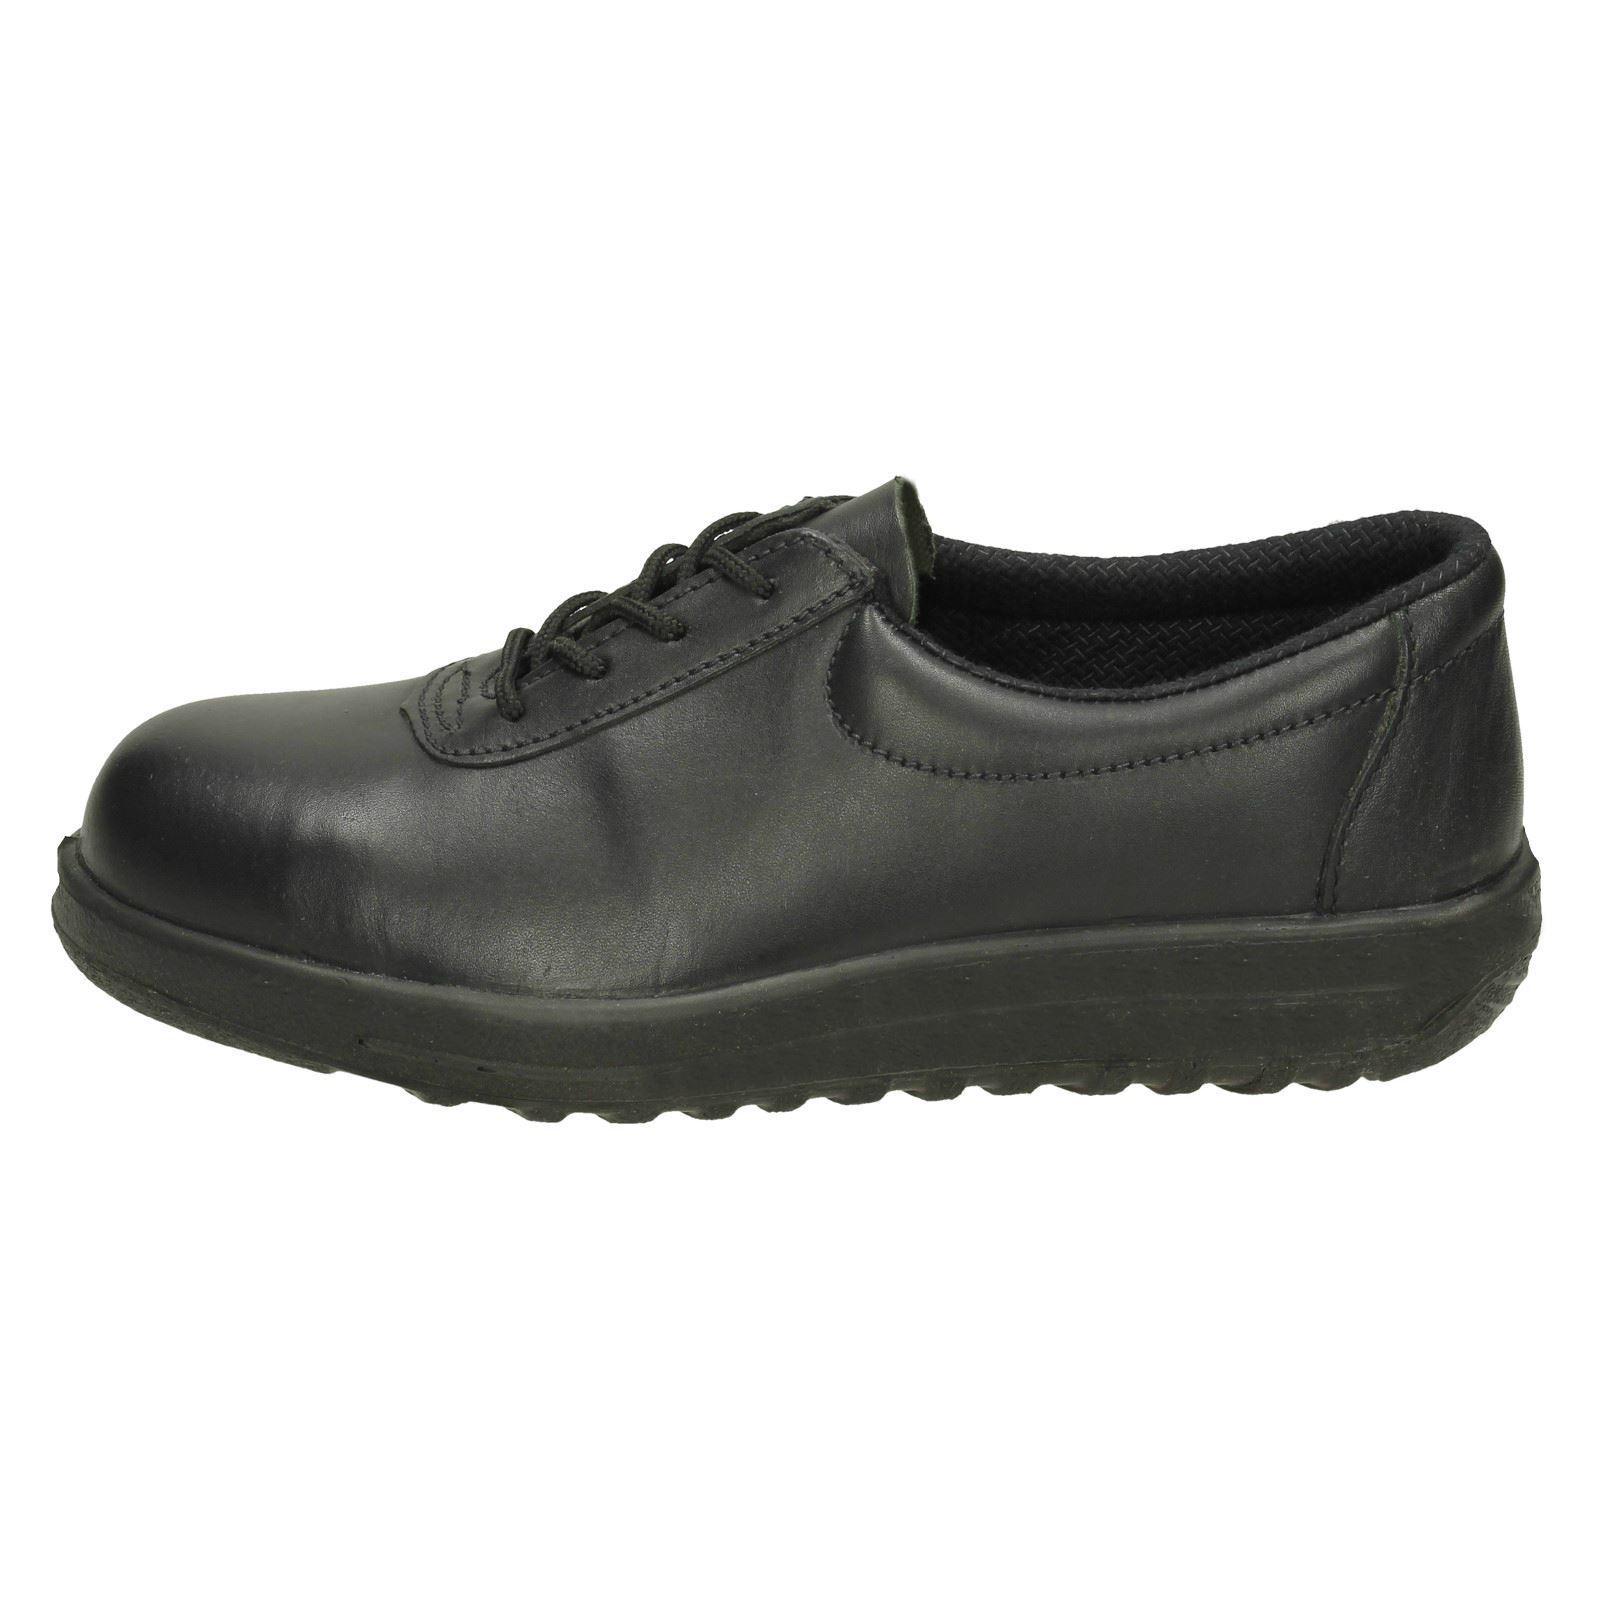 safety work shoes 3483 LADIES TOTECTORS